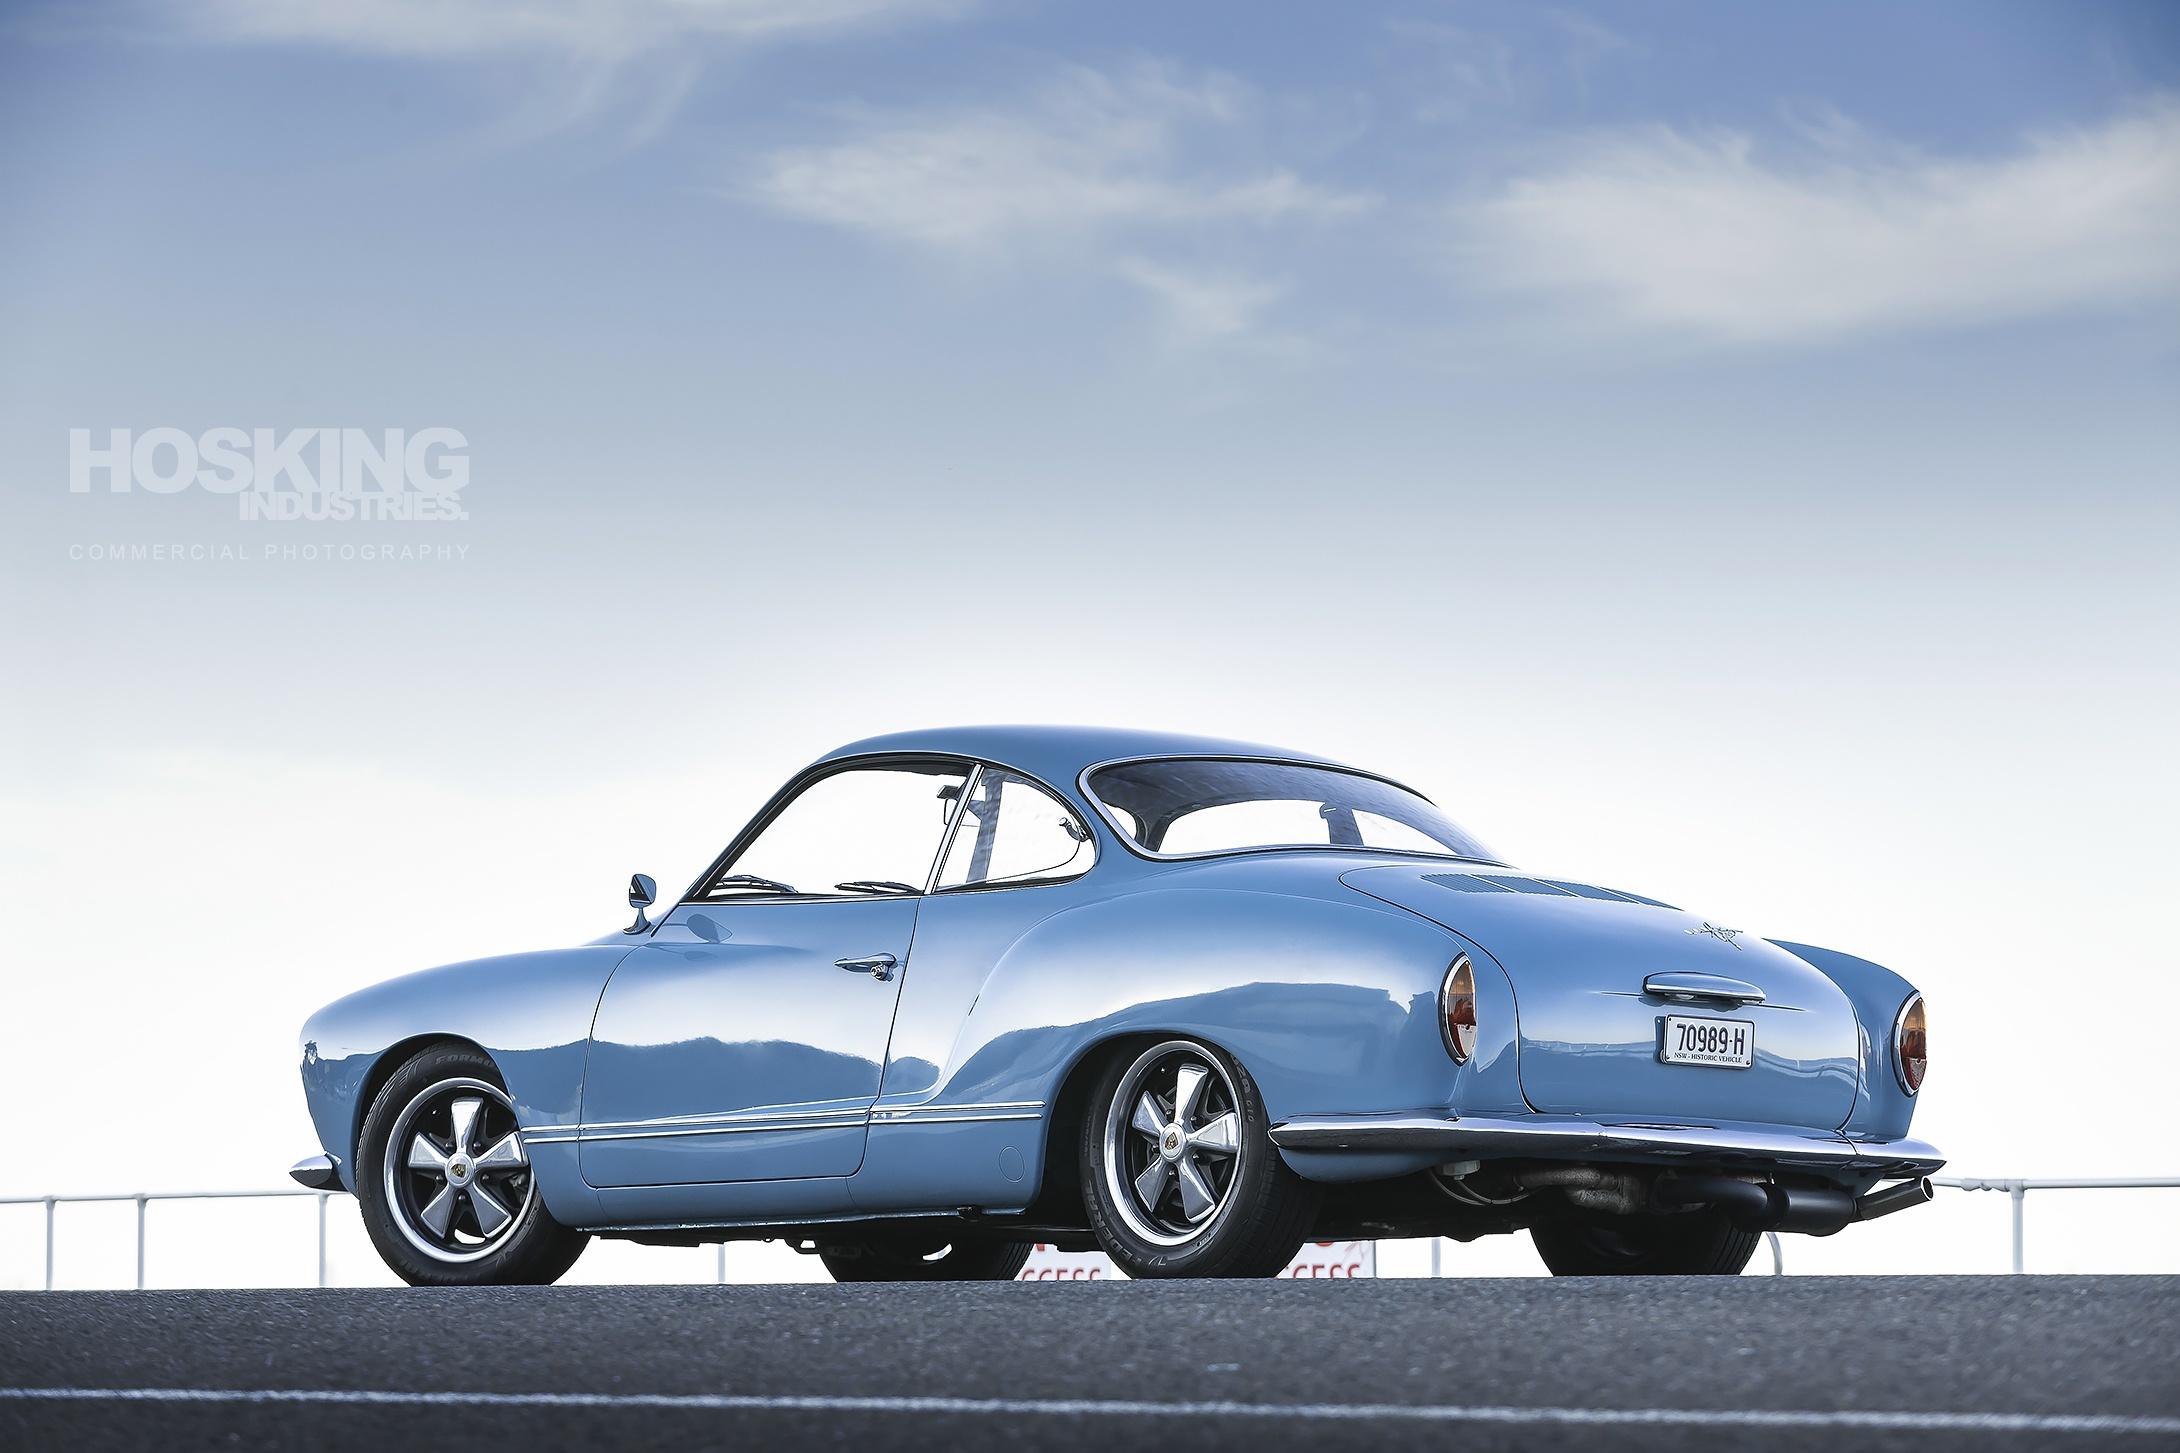 Fabion's powder blue VW Karmann Ghia